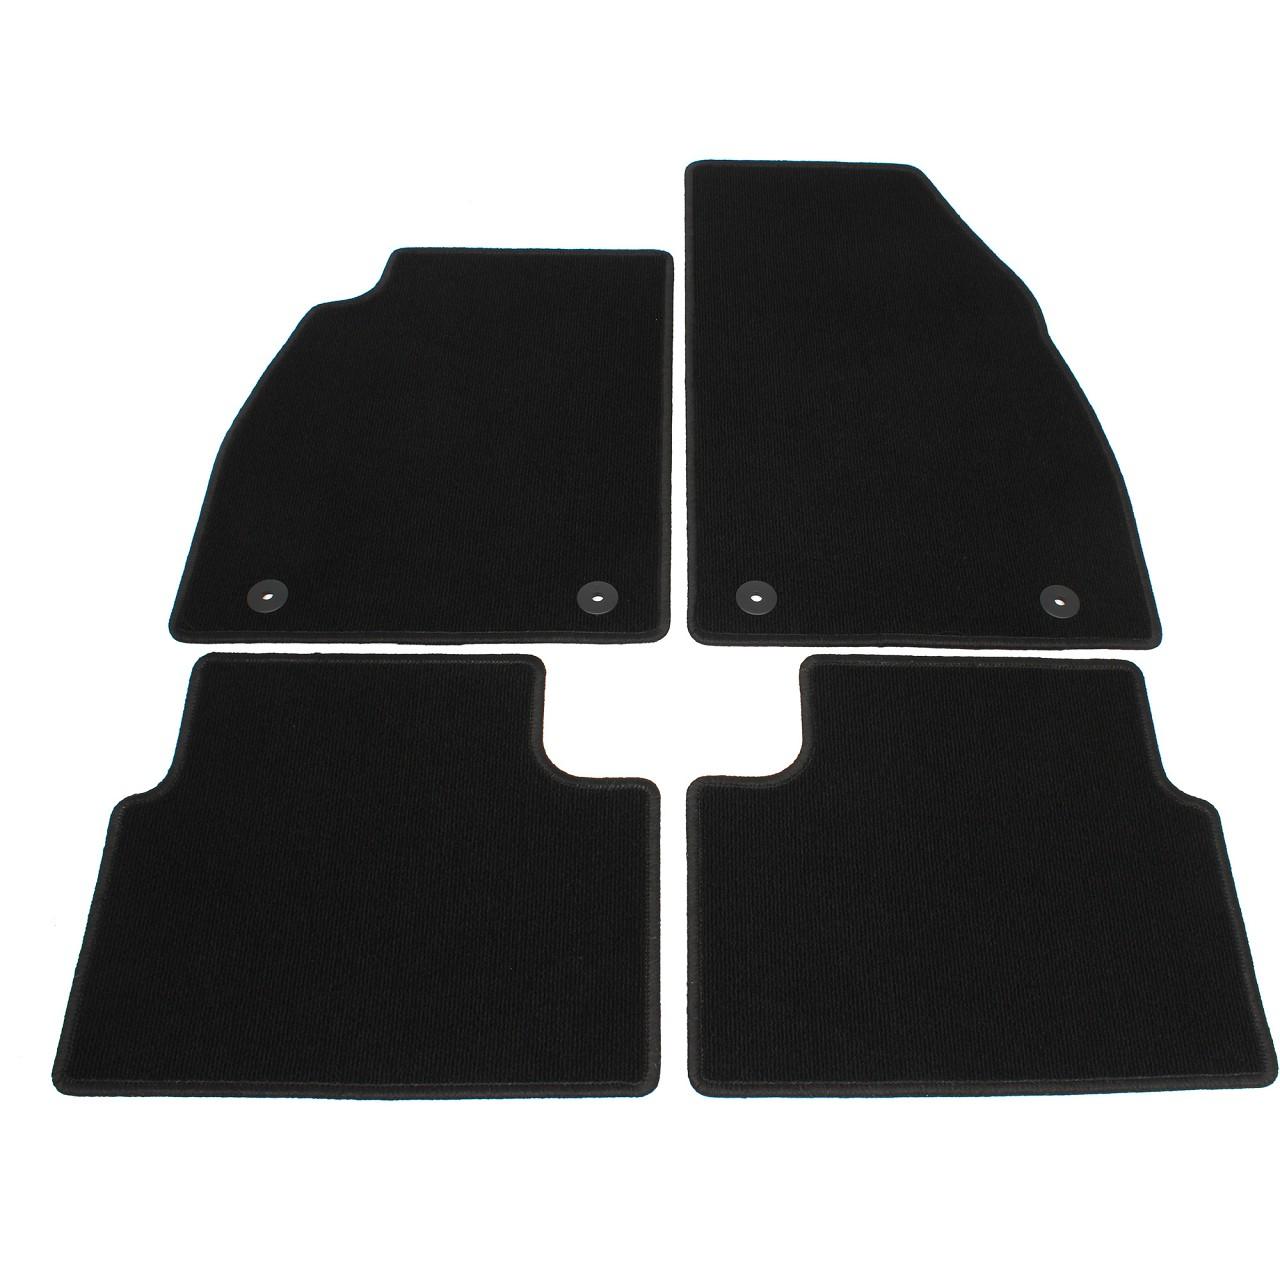 ORIGINAL Opel Textilmatten Fußmatten Automatten Satz Insignia 4-tlg 1791458